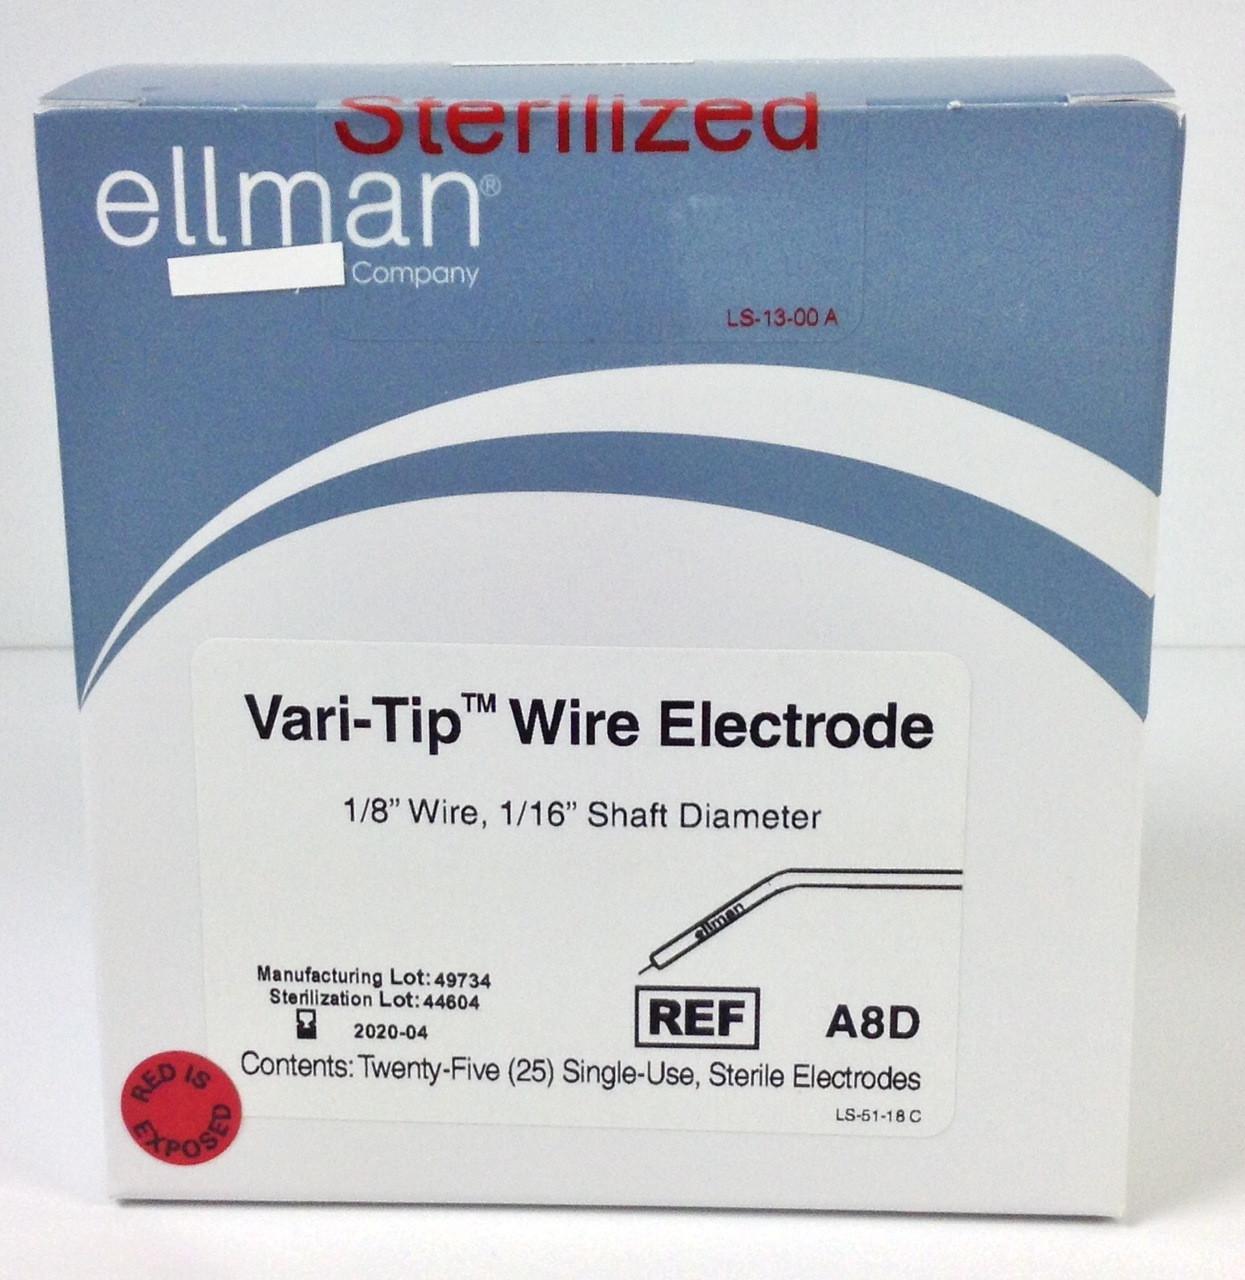 A8D - Vari-Tip Wire Electrode - 25pcs Sterile - Cynosure Australia